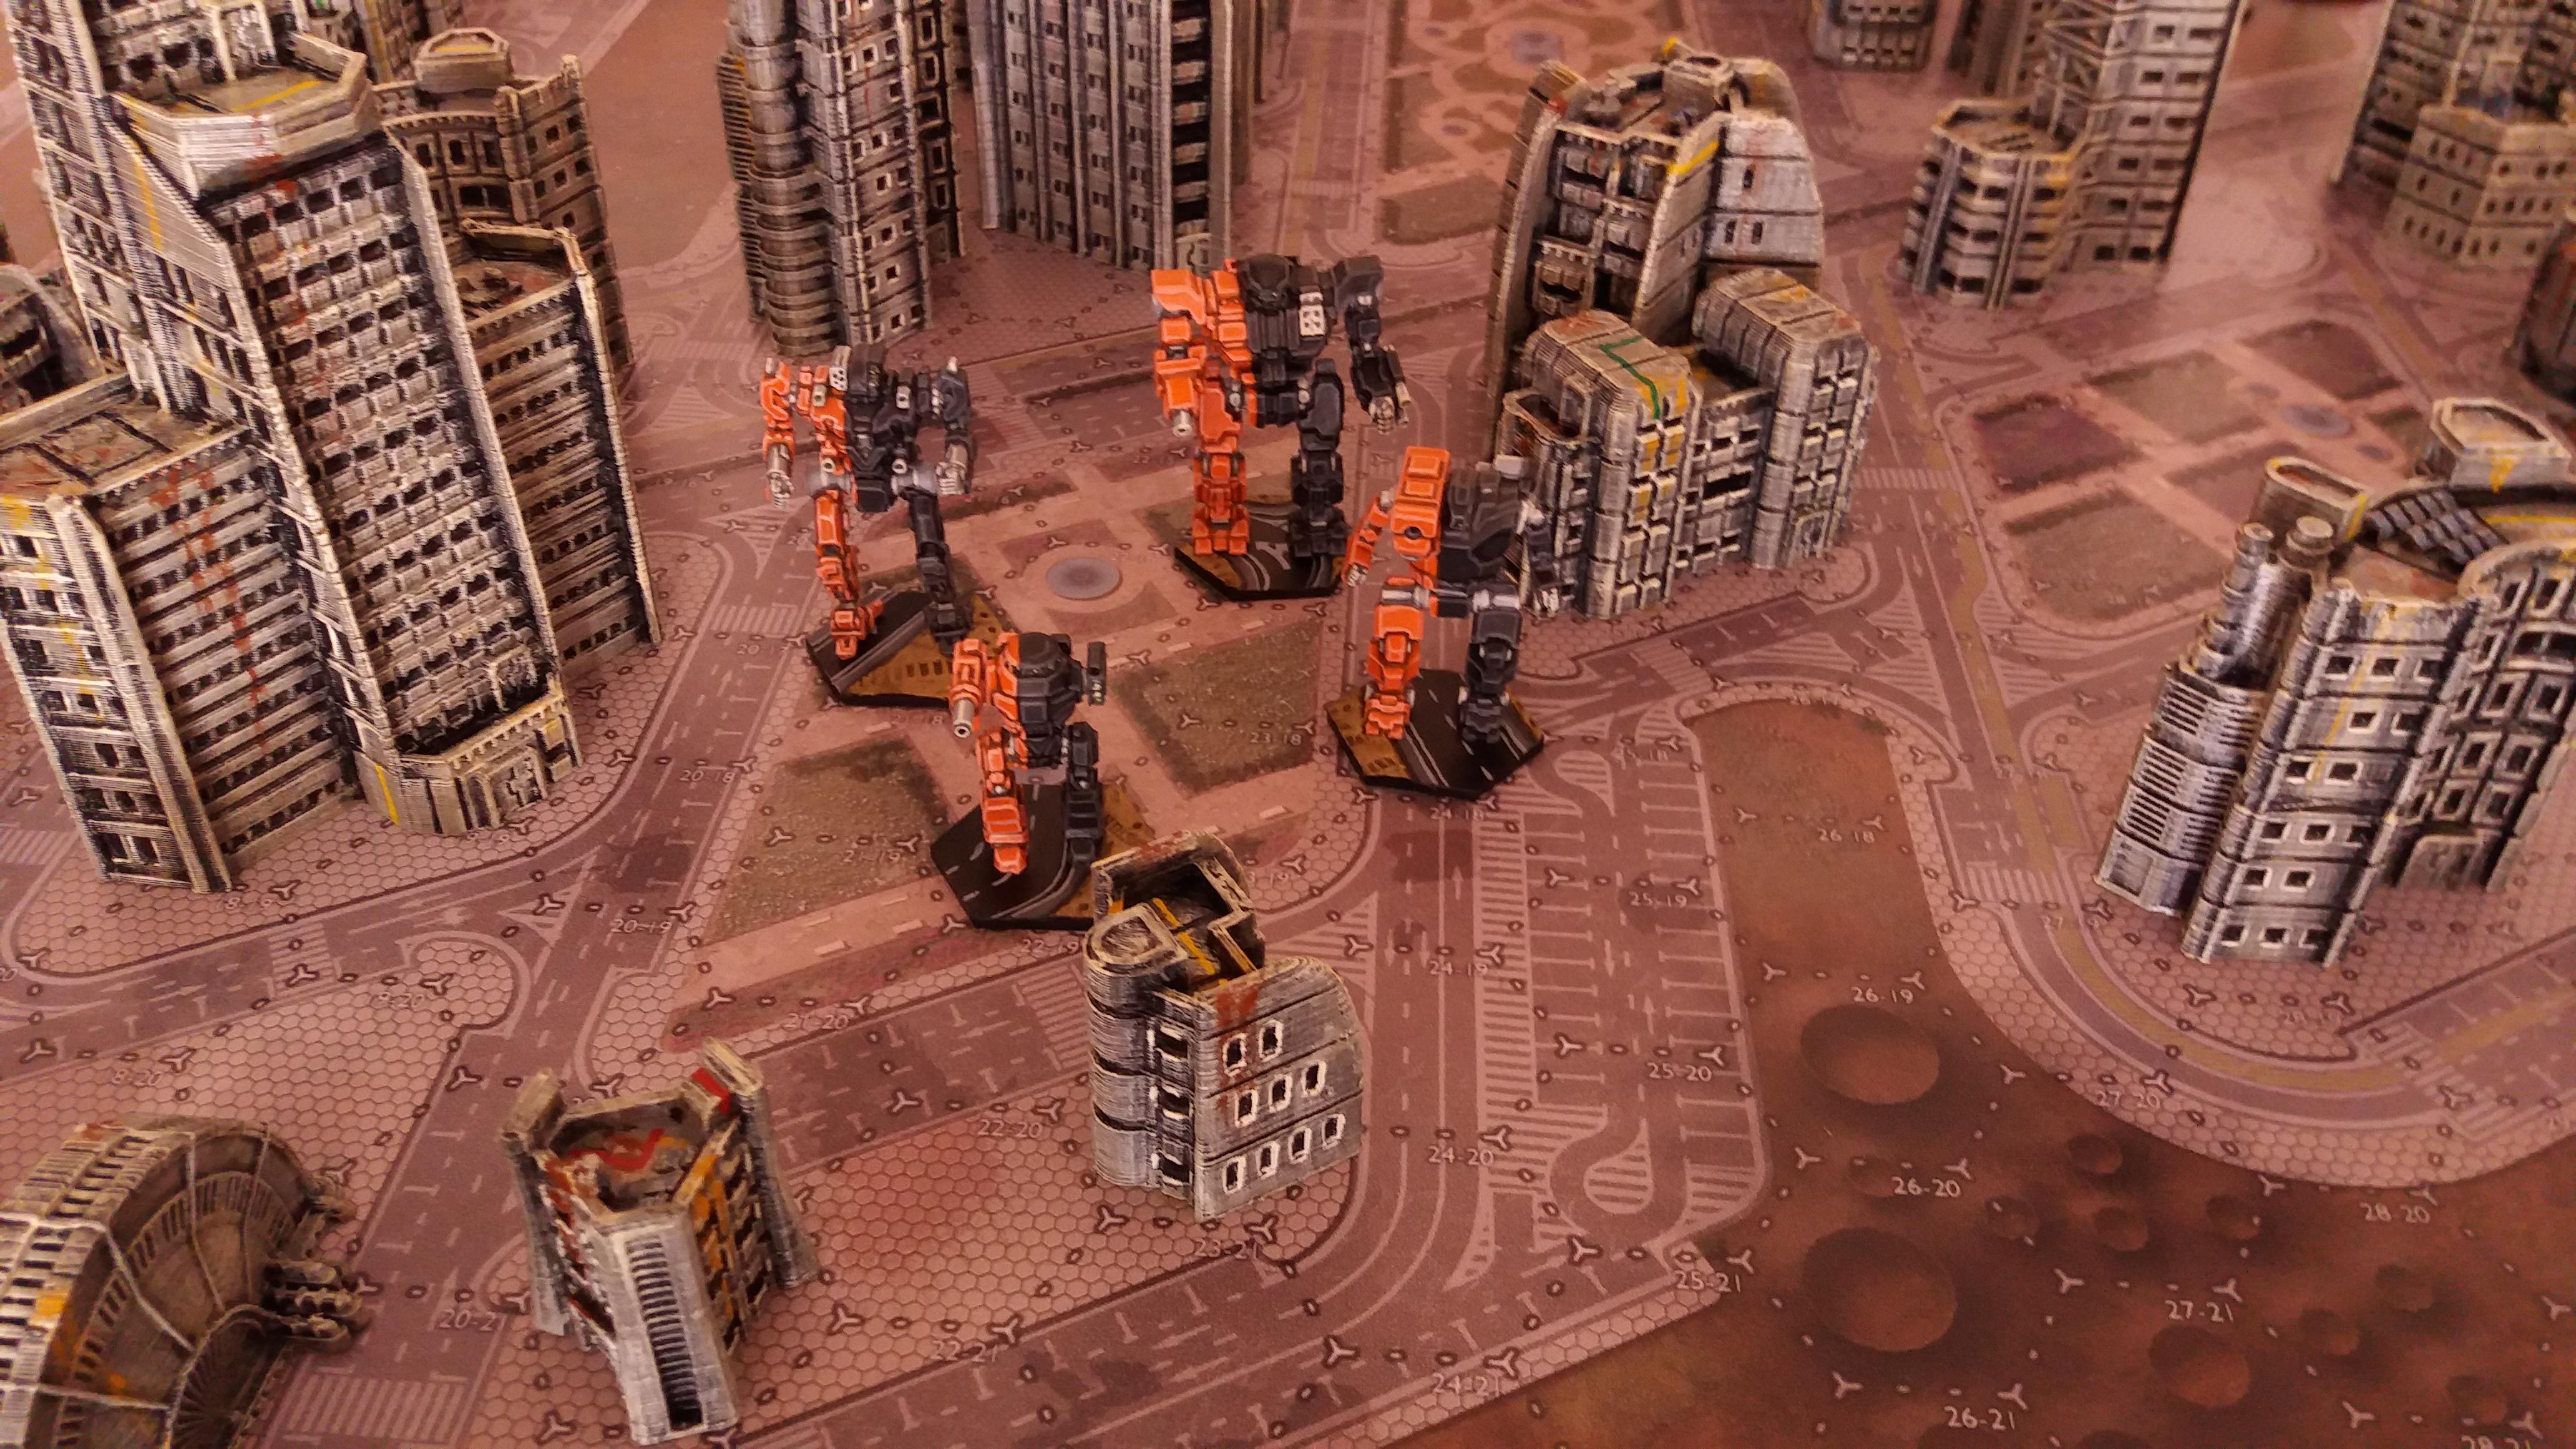 Battlemech, Battletech, Game Table, Hex, Hexmap, Inner Sphere, Map, Mapsheet, Mech, Mechcommander, Mechwarrior, Terrain